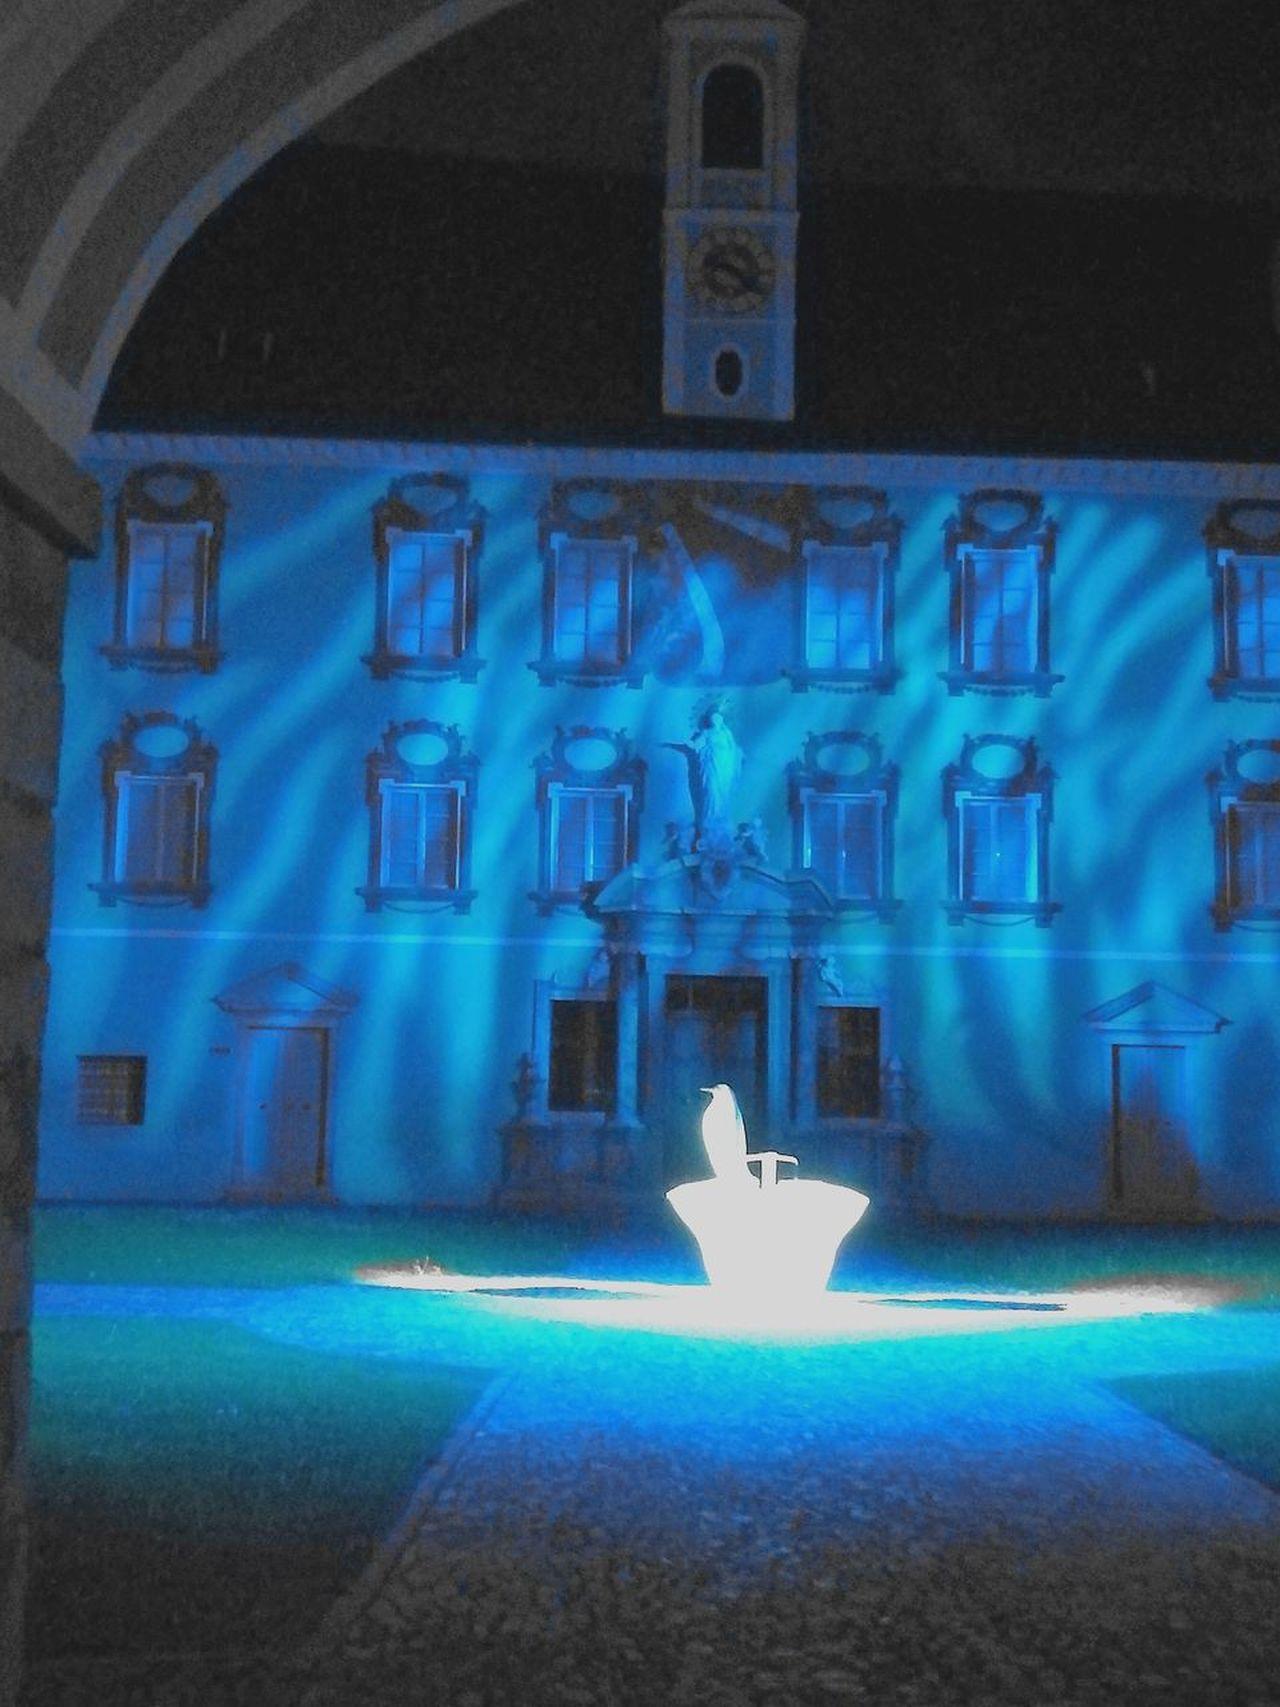 Bressanone Isarco Nightlife Tourism Illuminated Blue Architecture No People Night Italy🇮🇹 Alto Adige